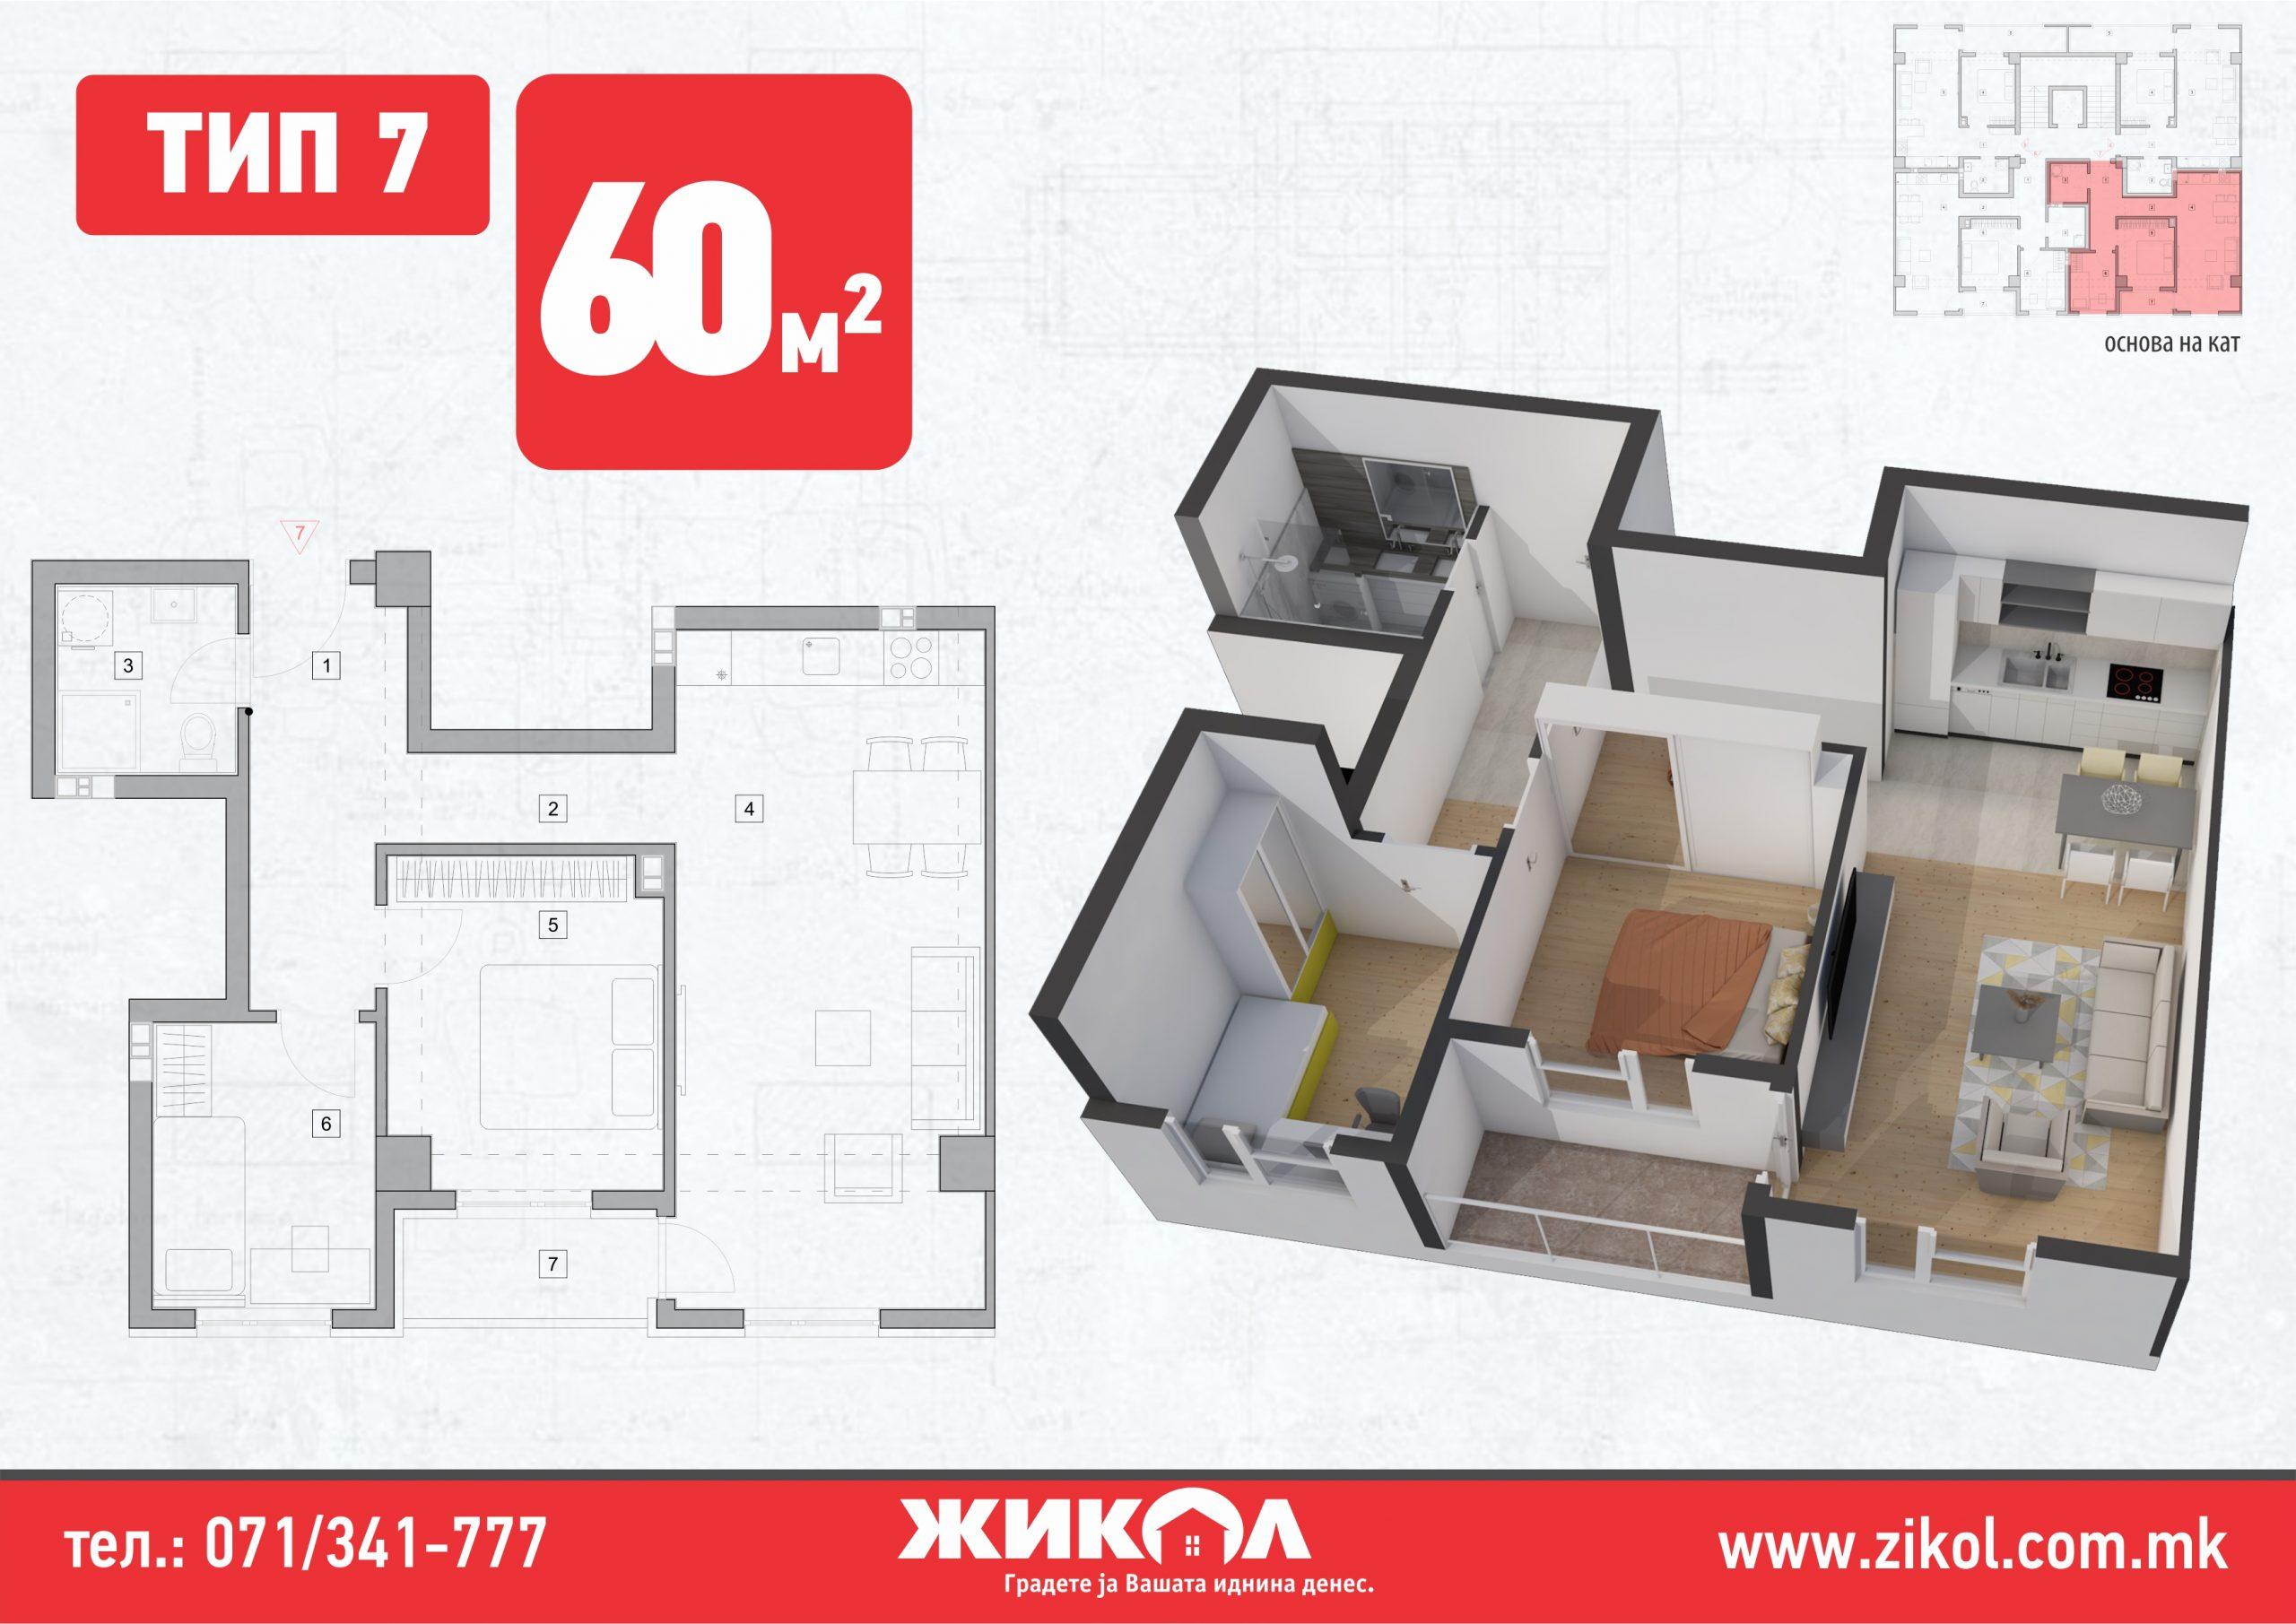 зграда 7, кат 1, стан 7